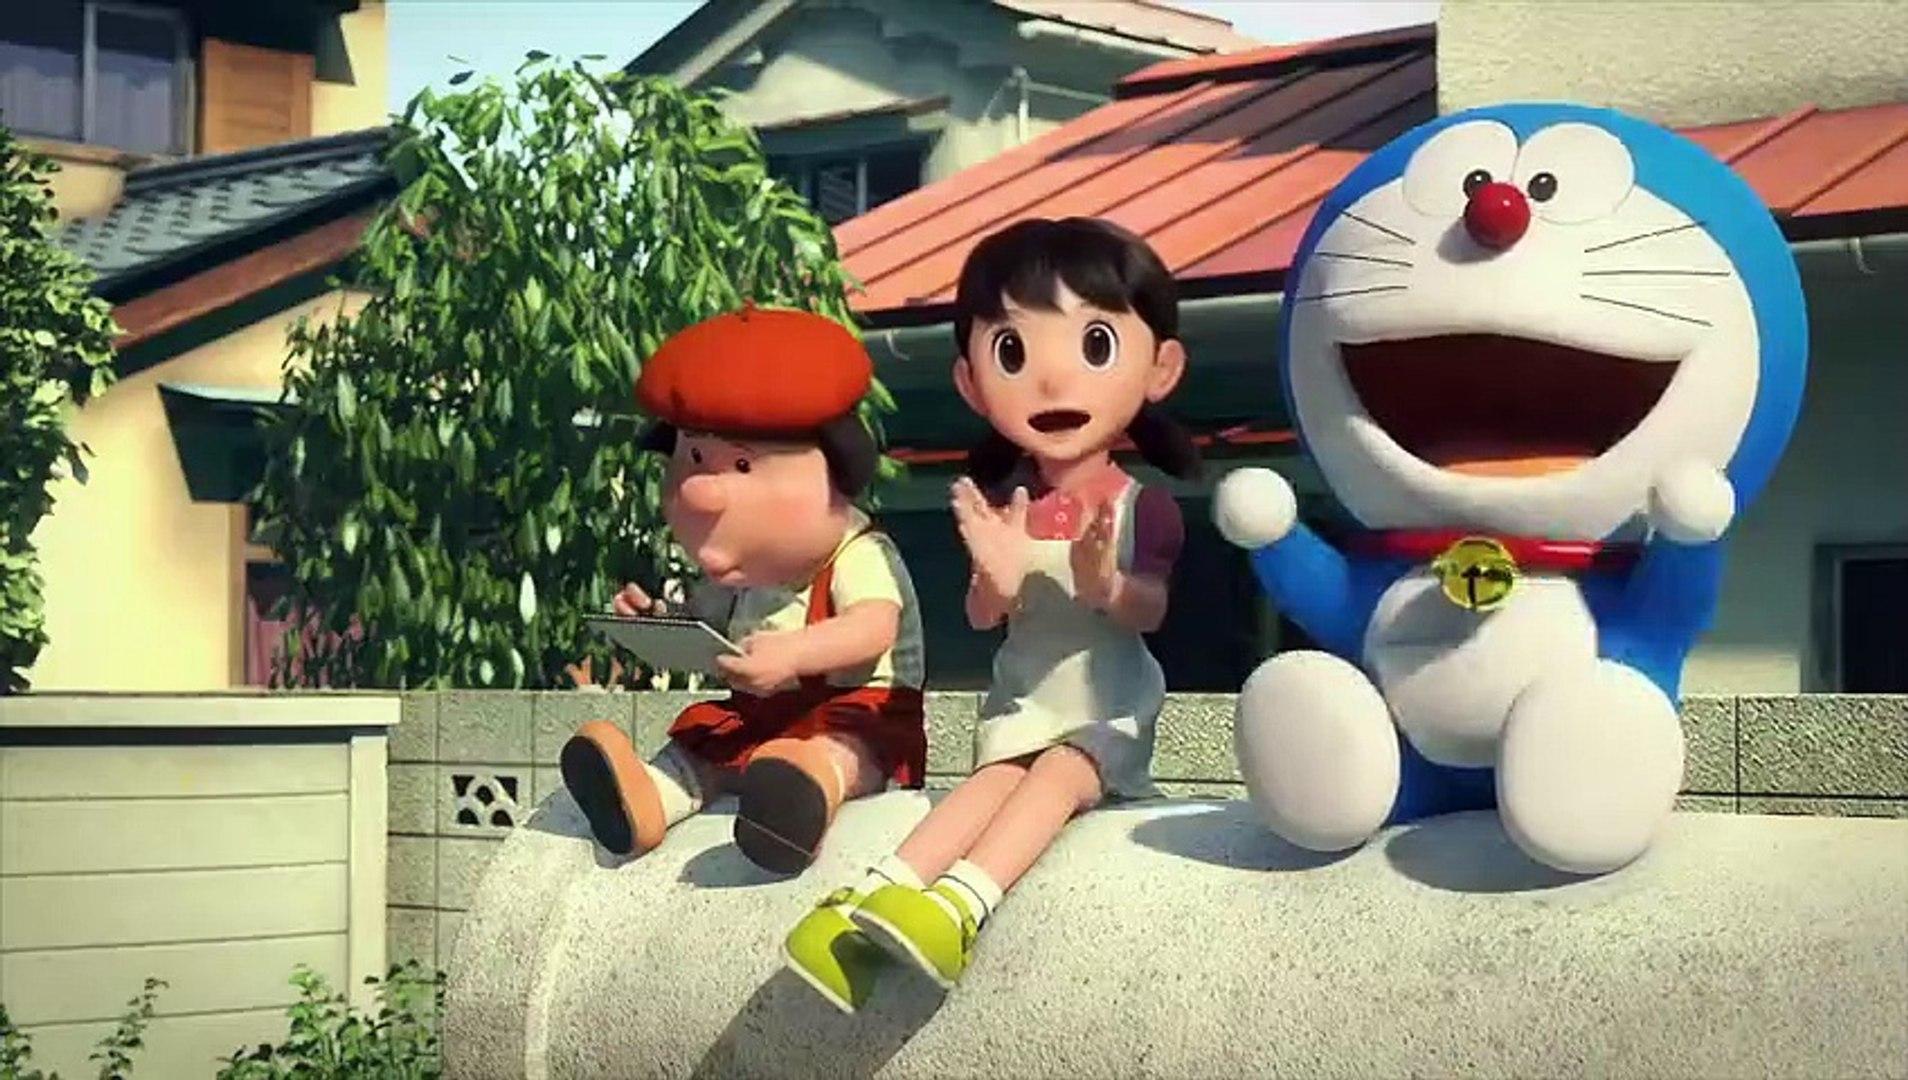 Pelicula de Stand by me Doraemon (Parte 1) - Vídeo Dailymotion